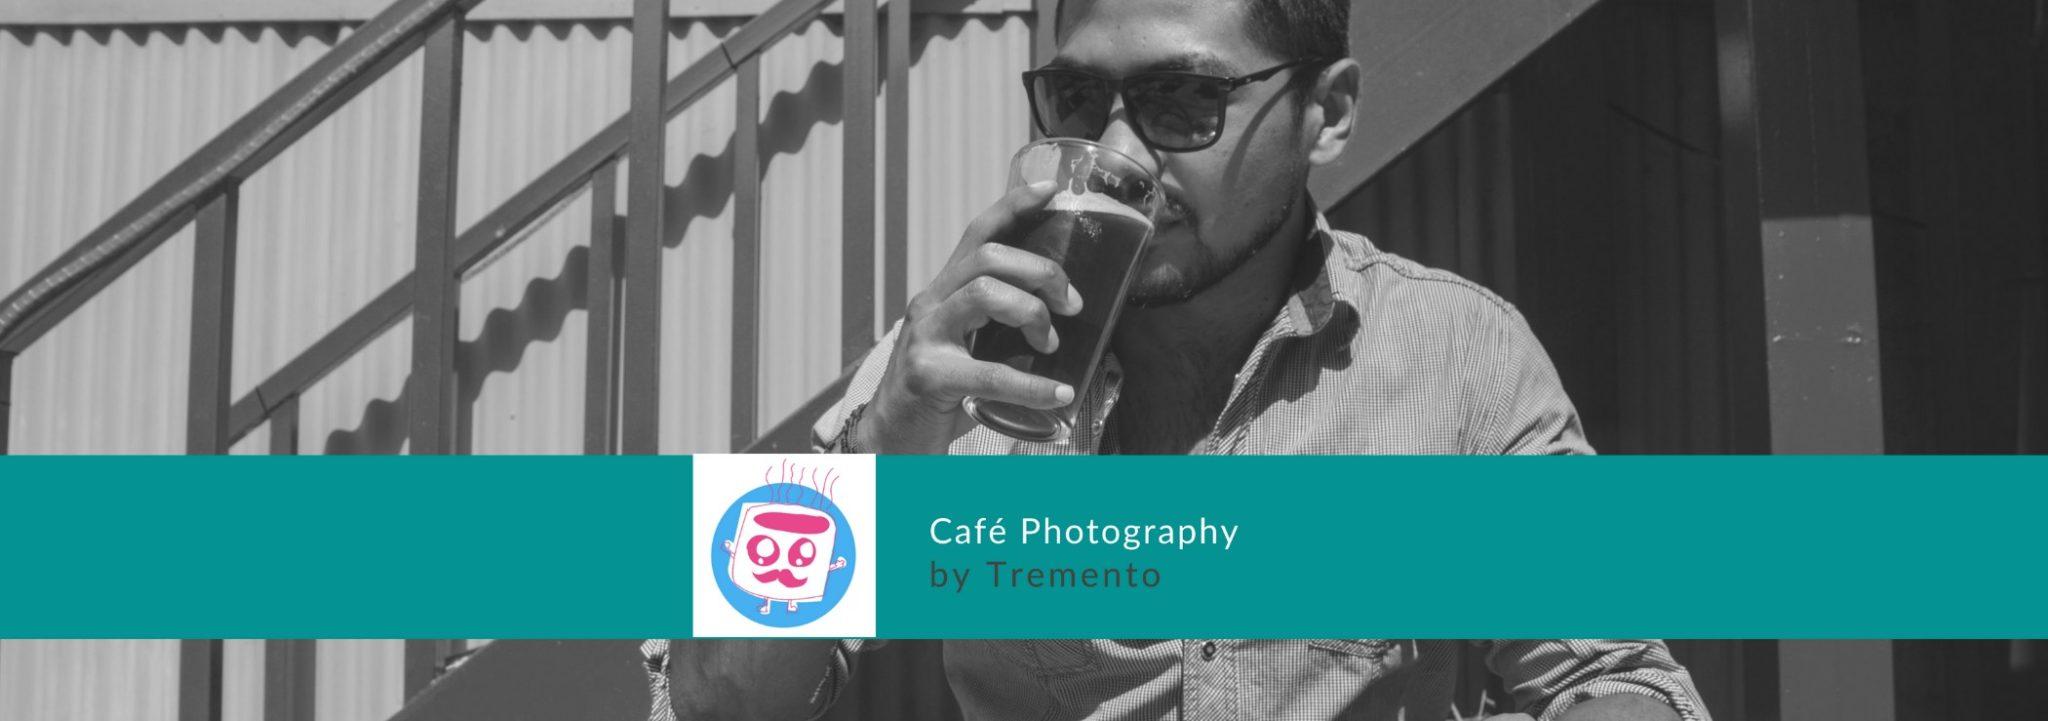 Café Restaurant Photography - Café de los deseos - San José - Tremento